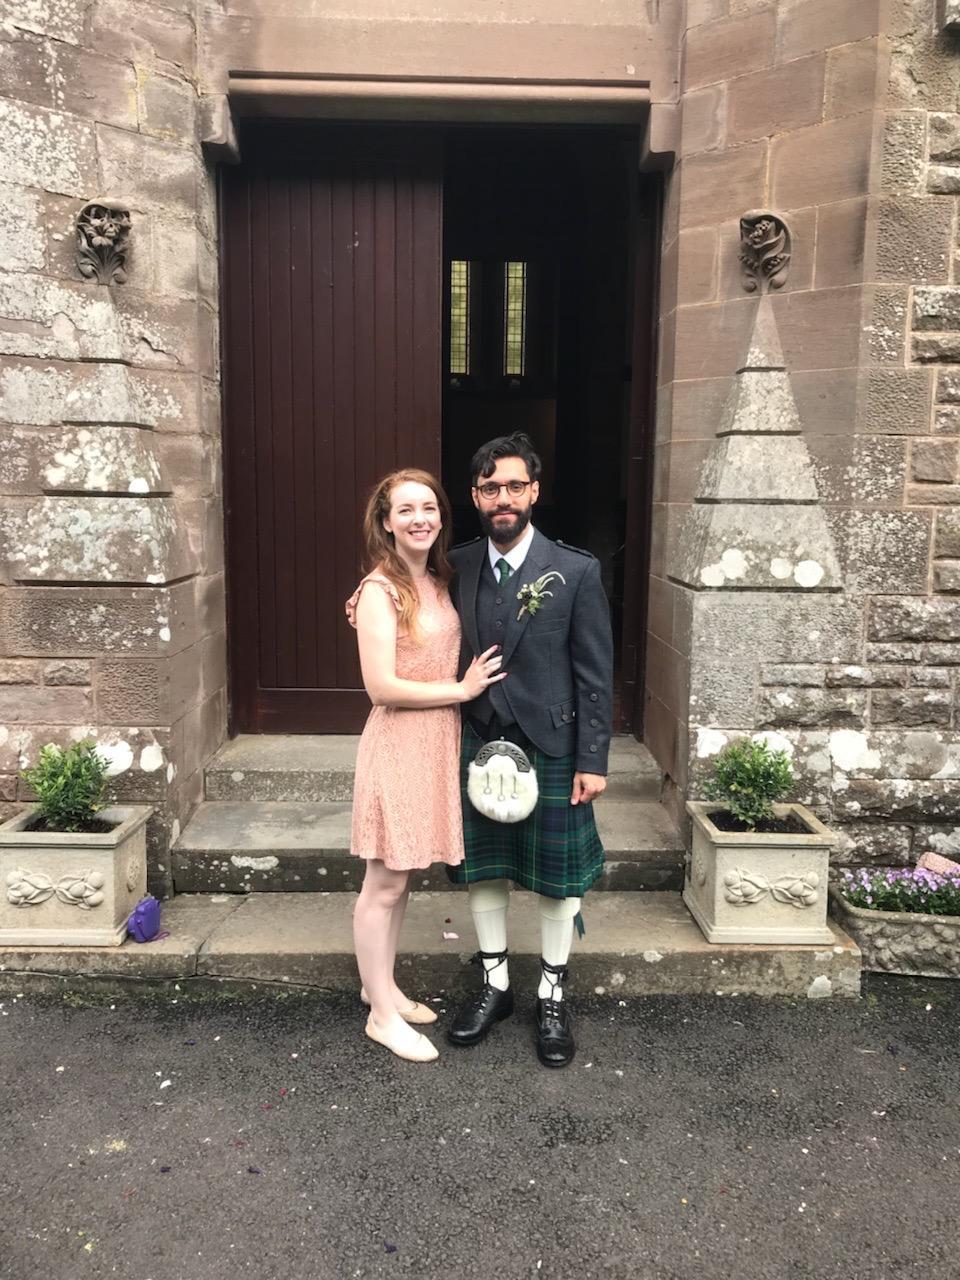 Jeremy & Jenni's Wedding August 2018